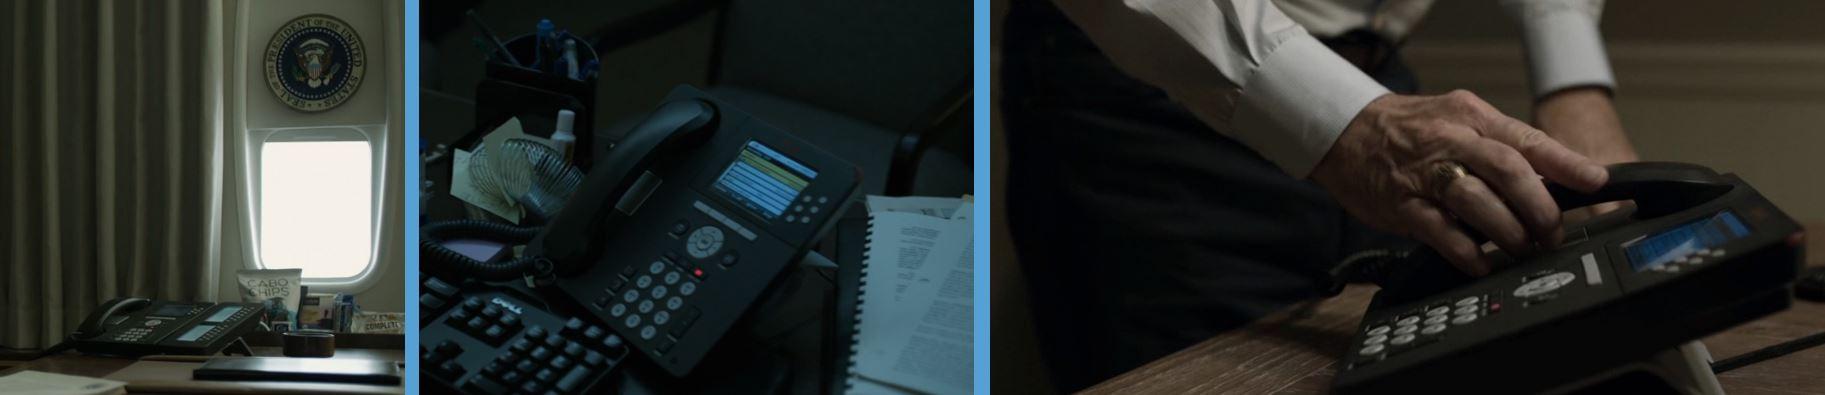 avaya telephones telephones in house of cards season 4